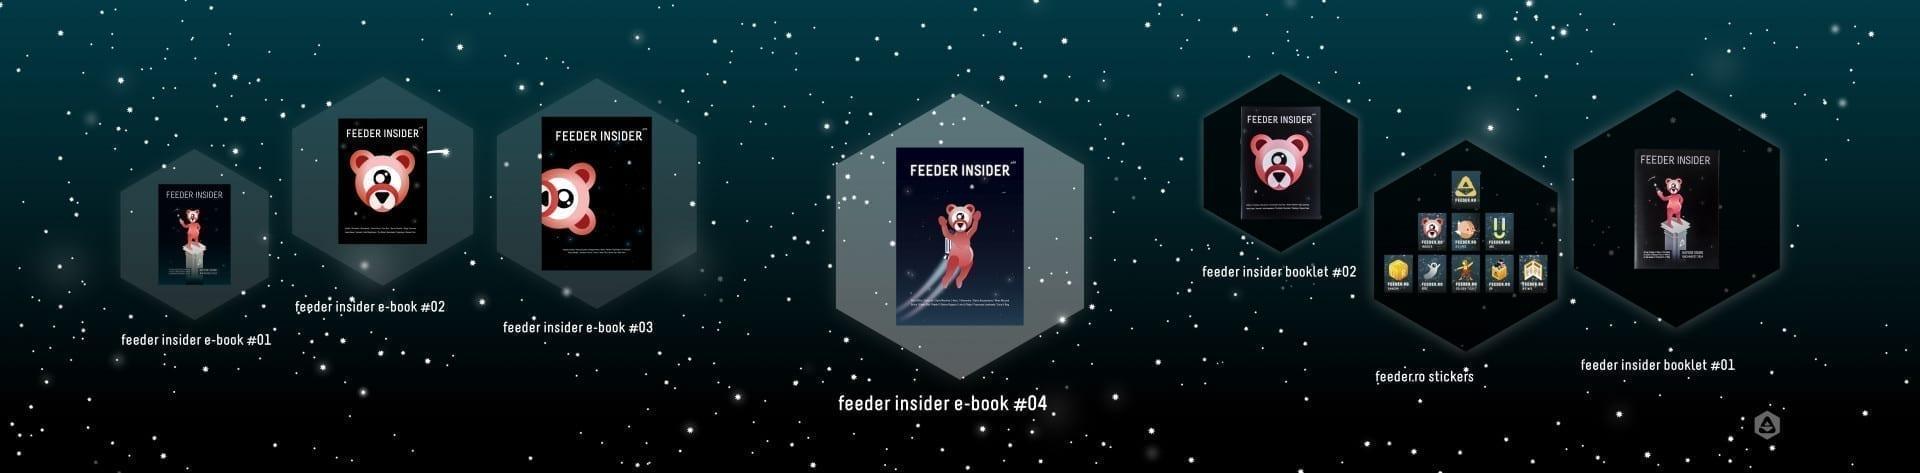 shop feeder insider